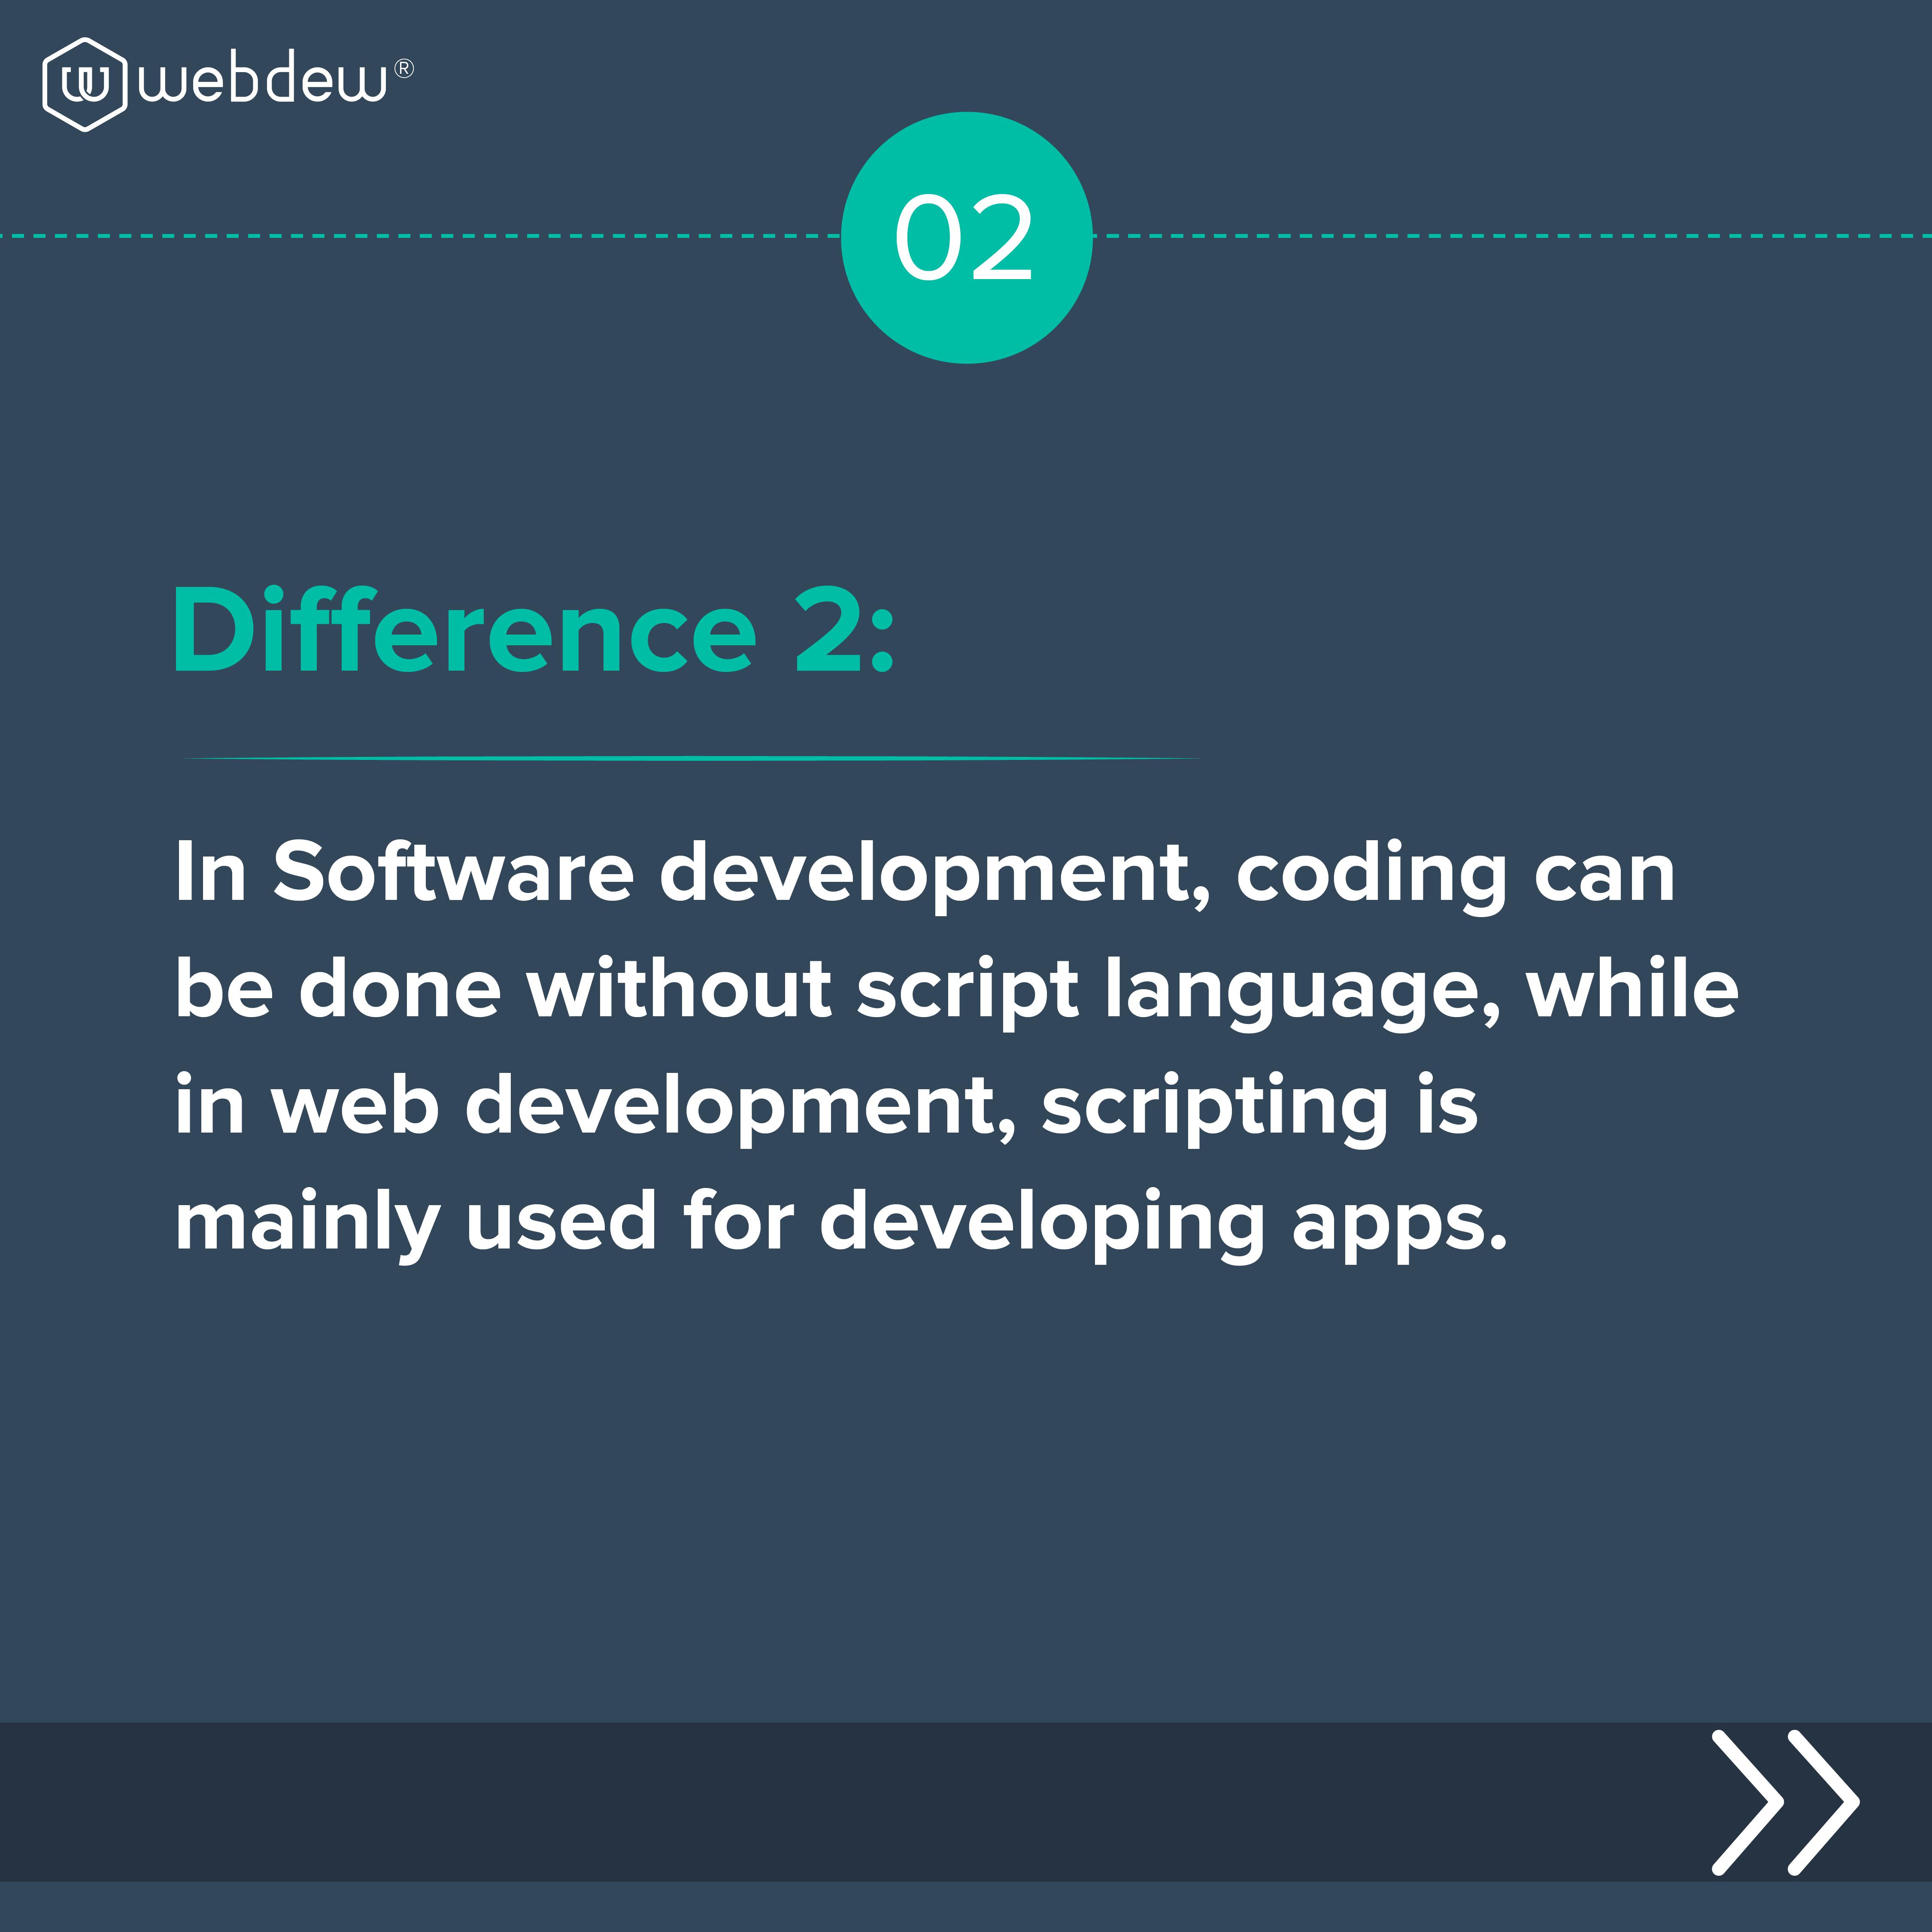 web-development-vs-software-development-difference-two